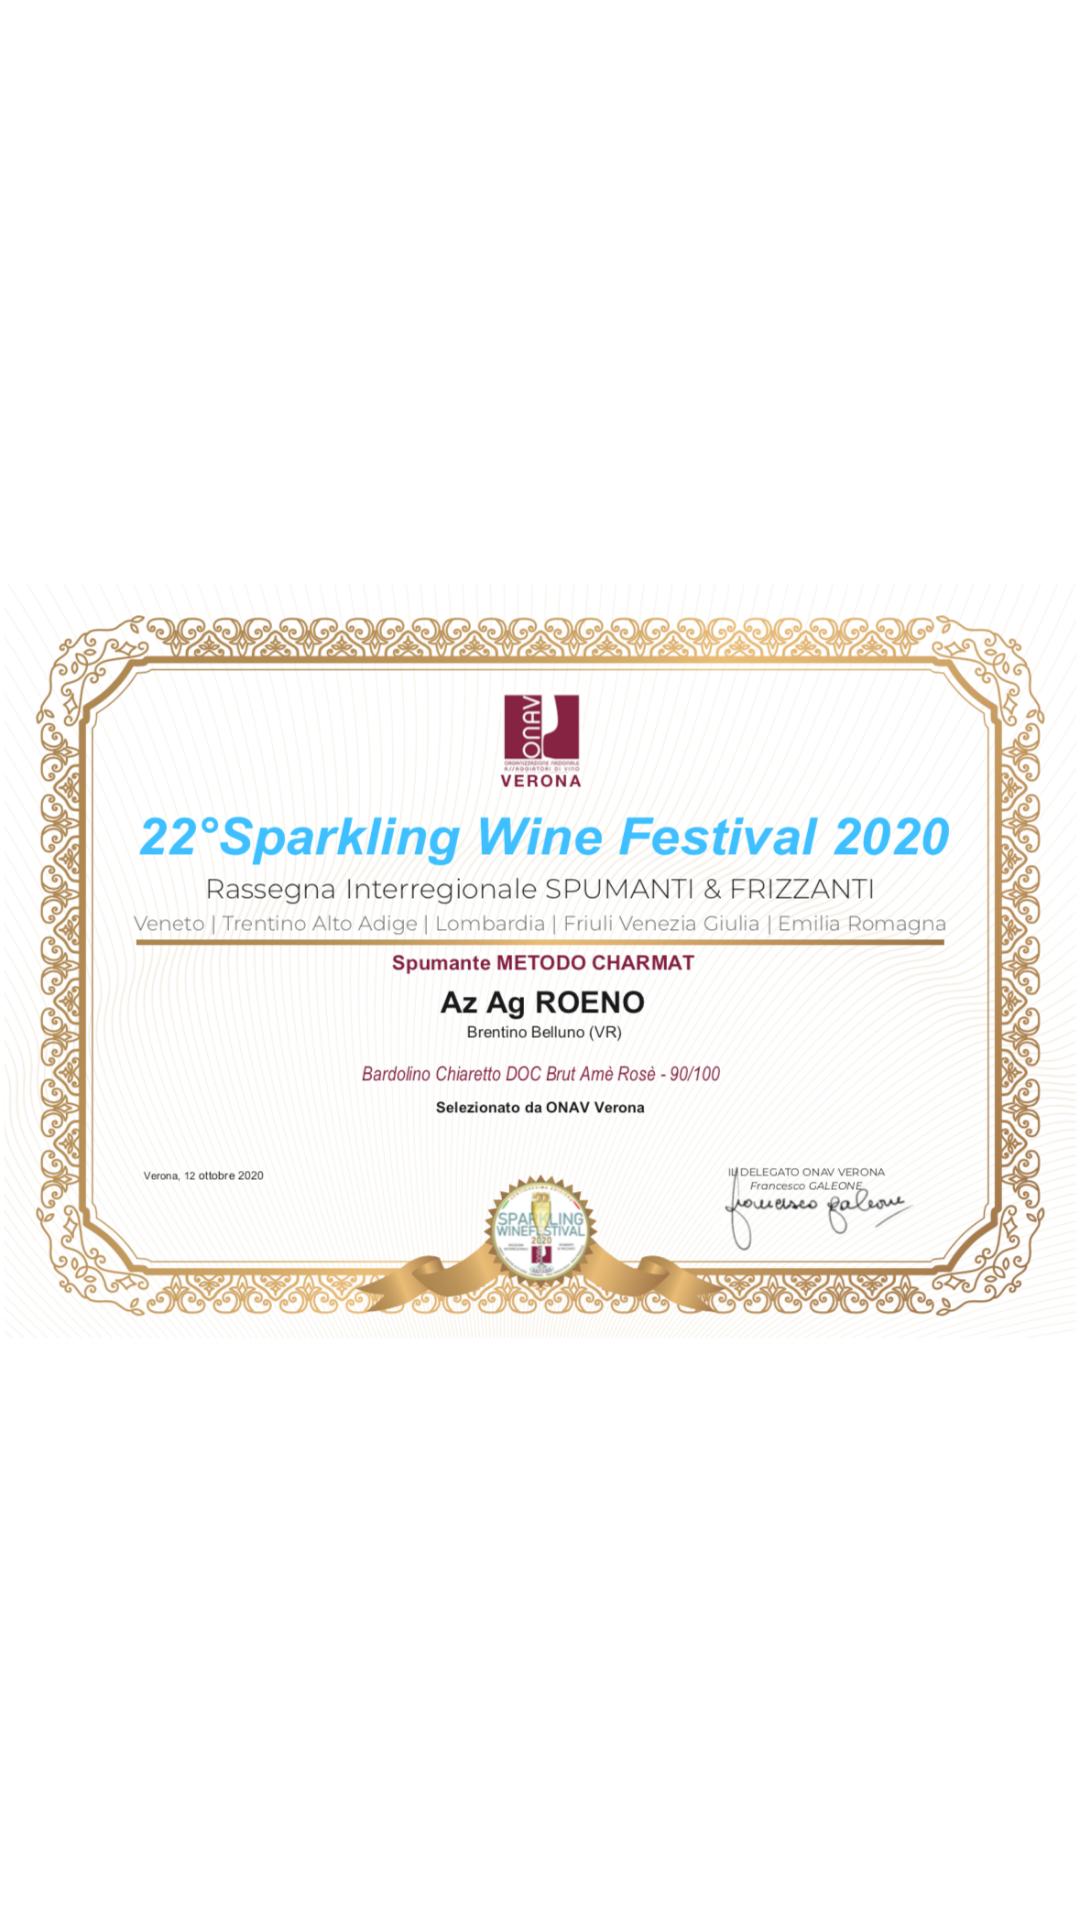 22° SPARKLING WINE FESTIVAL 2020